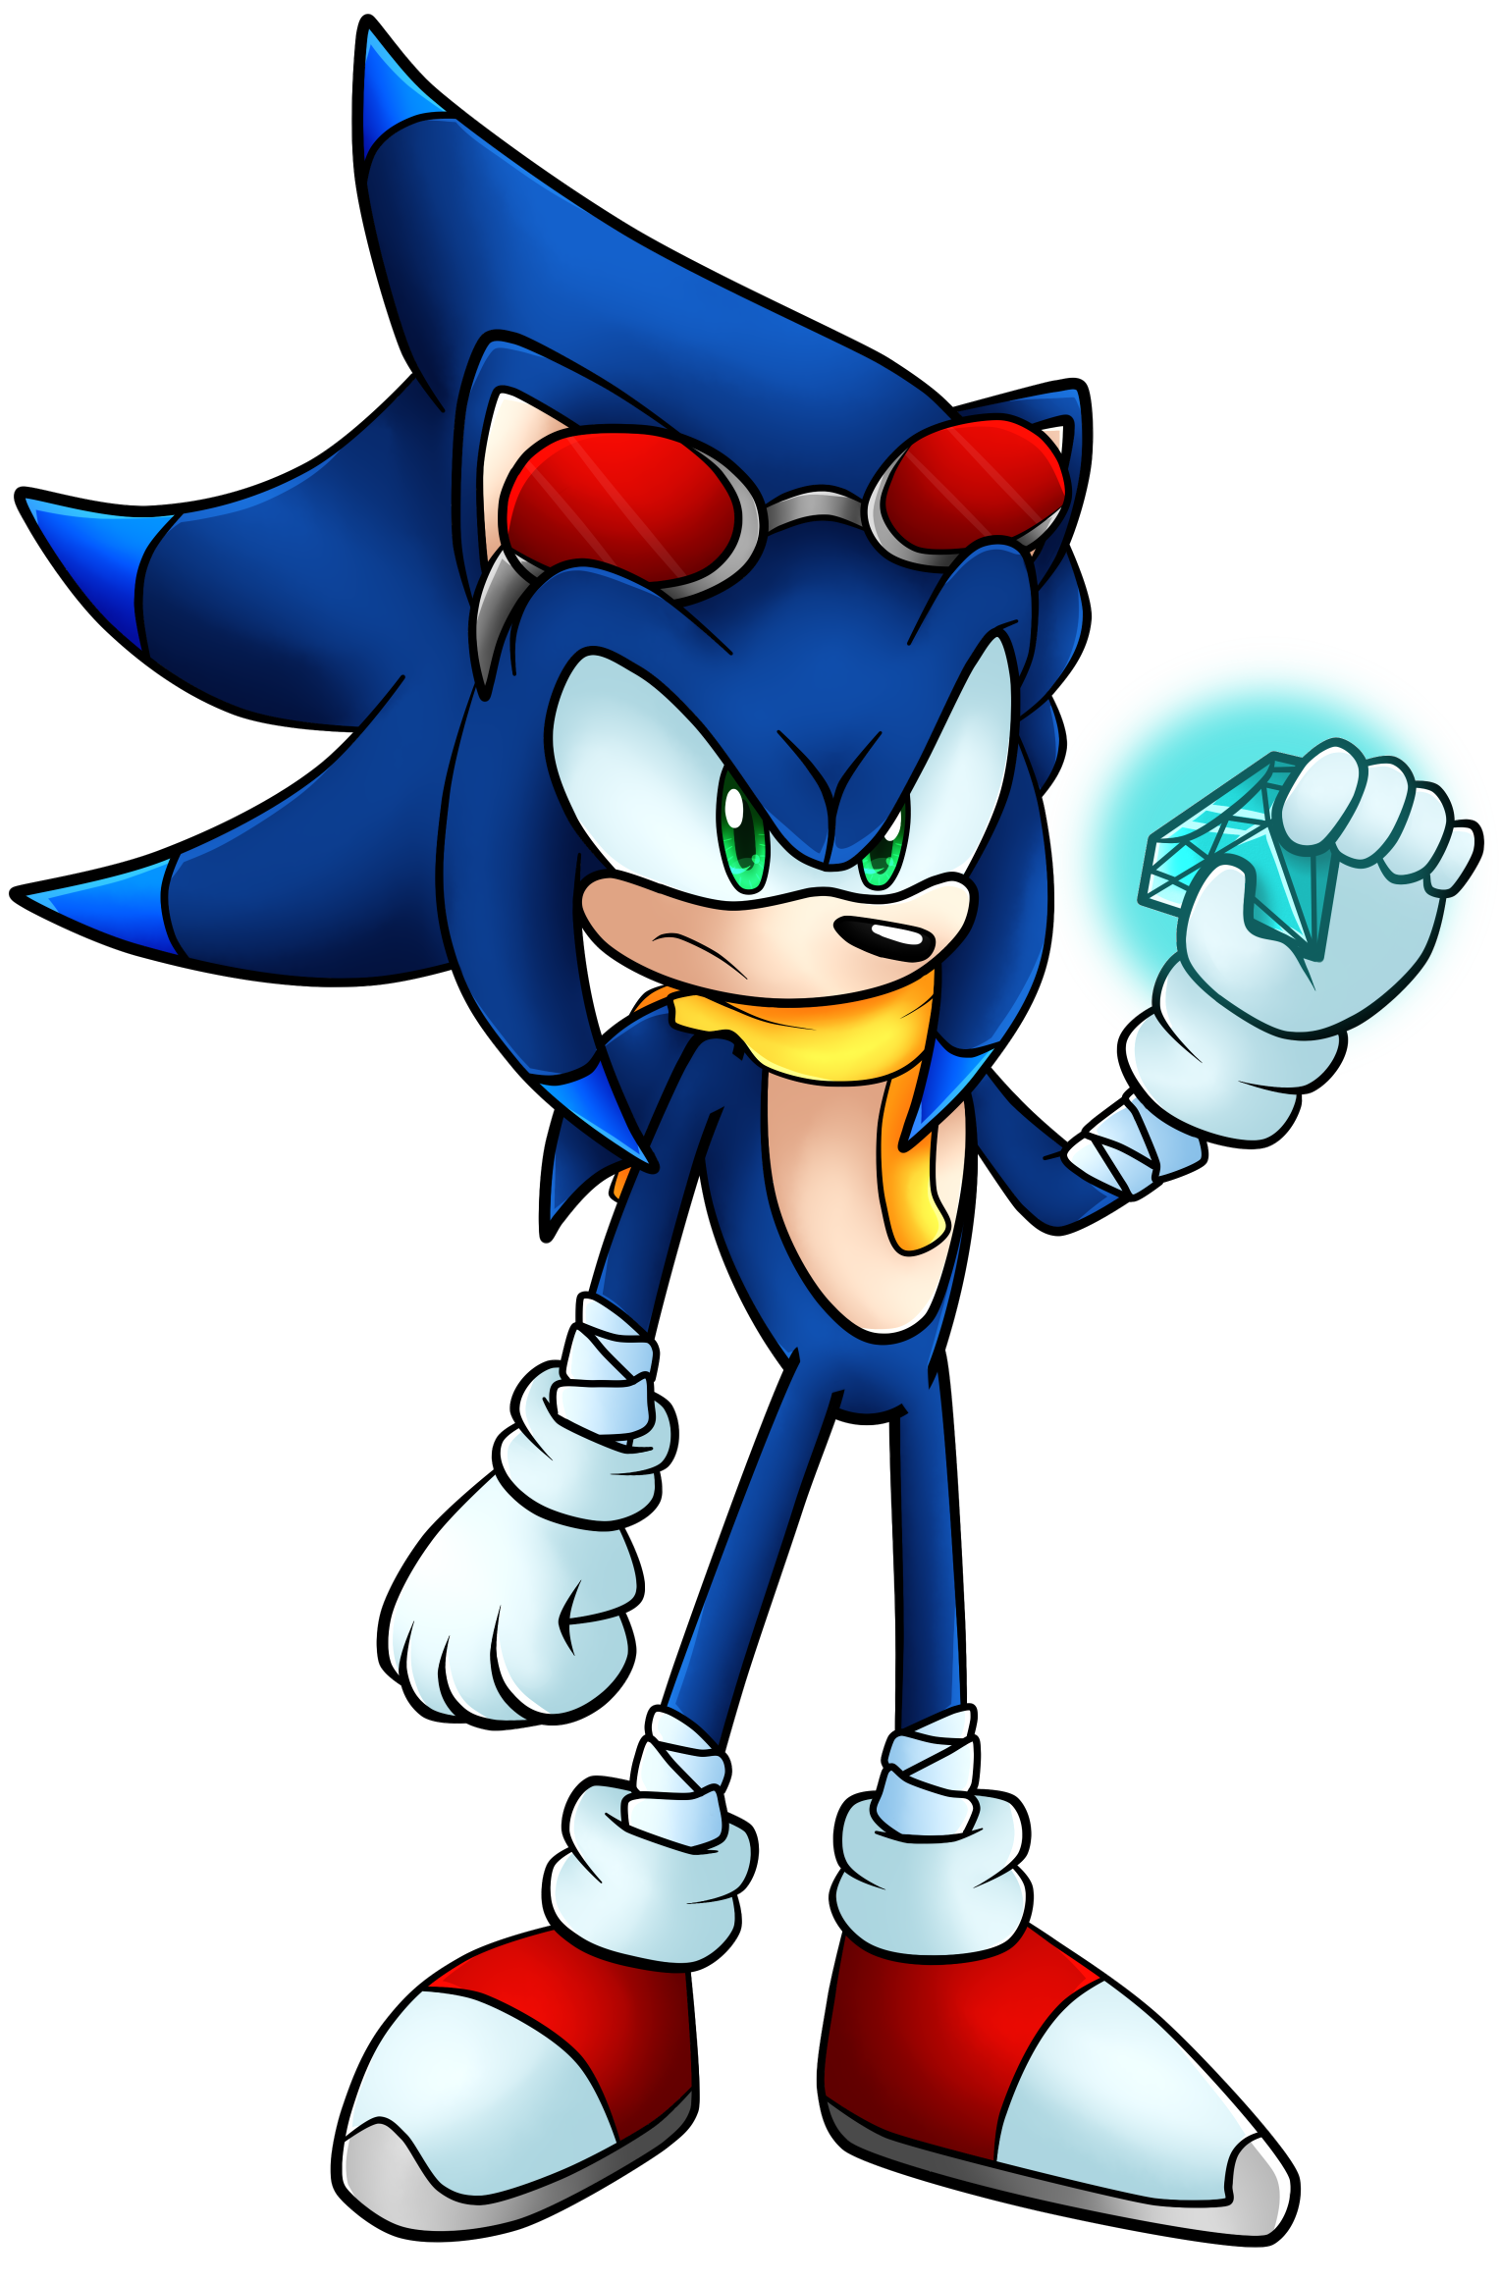 Trident The Hedgehog | Sonic Fanon Wiki | FANDOM powered ...